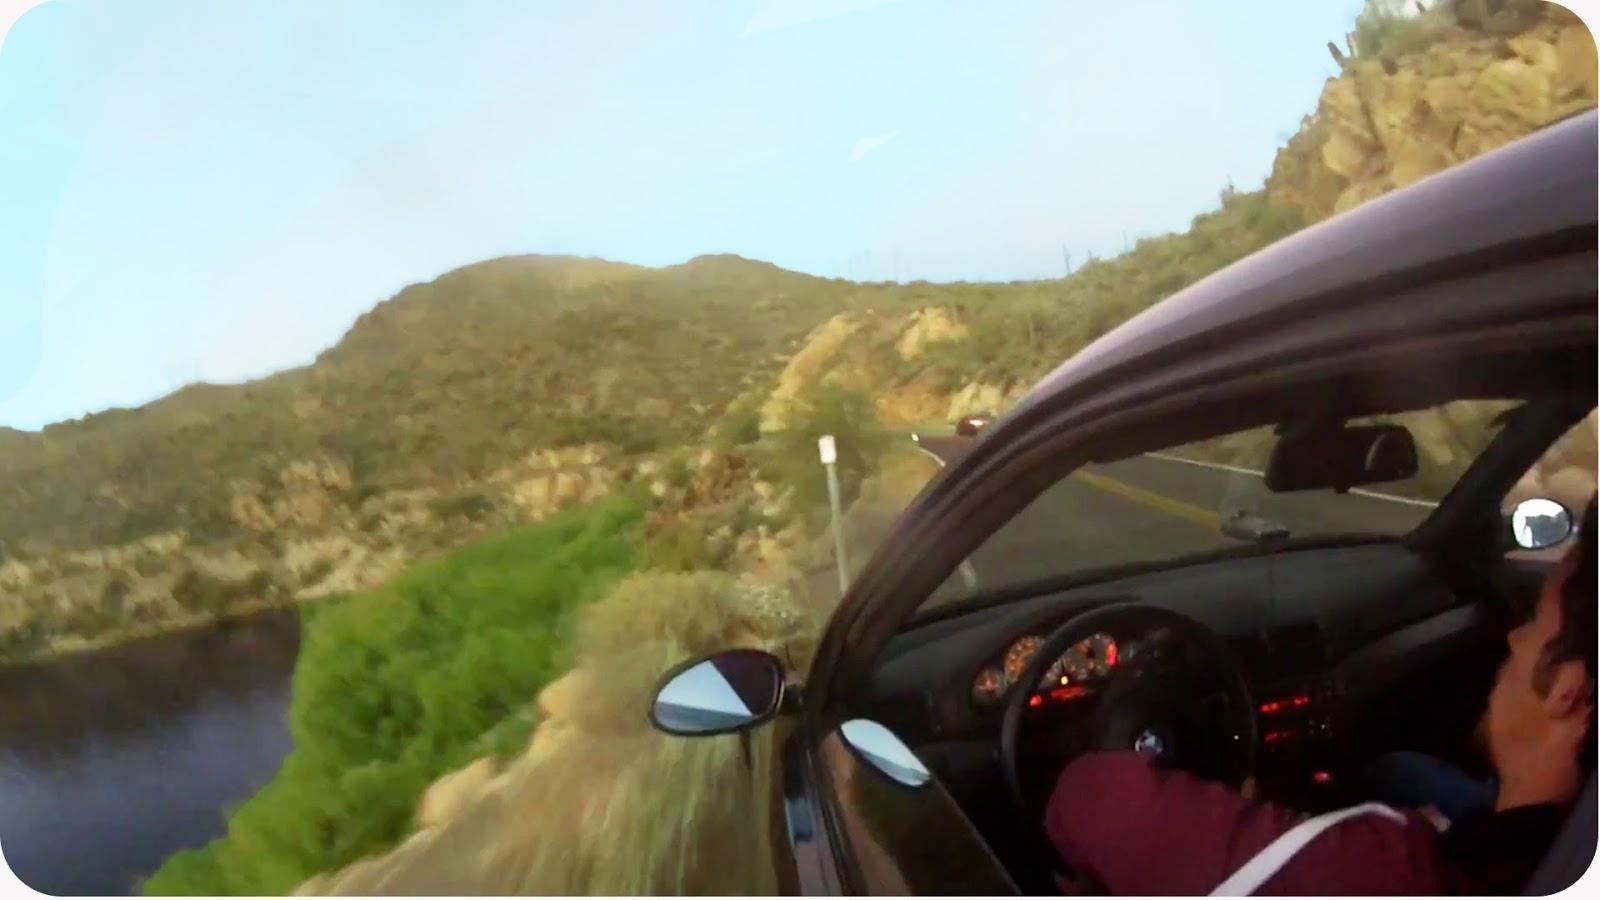 M32BCliff2BDive2BRaw2BFootage Μια Bmw M3 E46 πέφτει στον γκρεμό! BMW, BMW M3, BMW M3 E 46, Cliff, videos